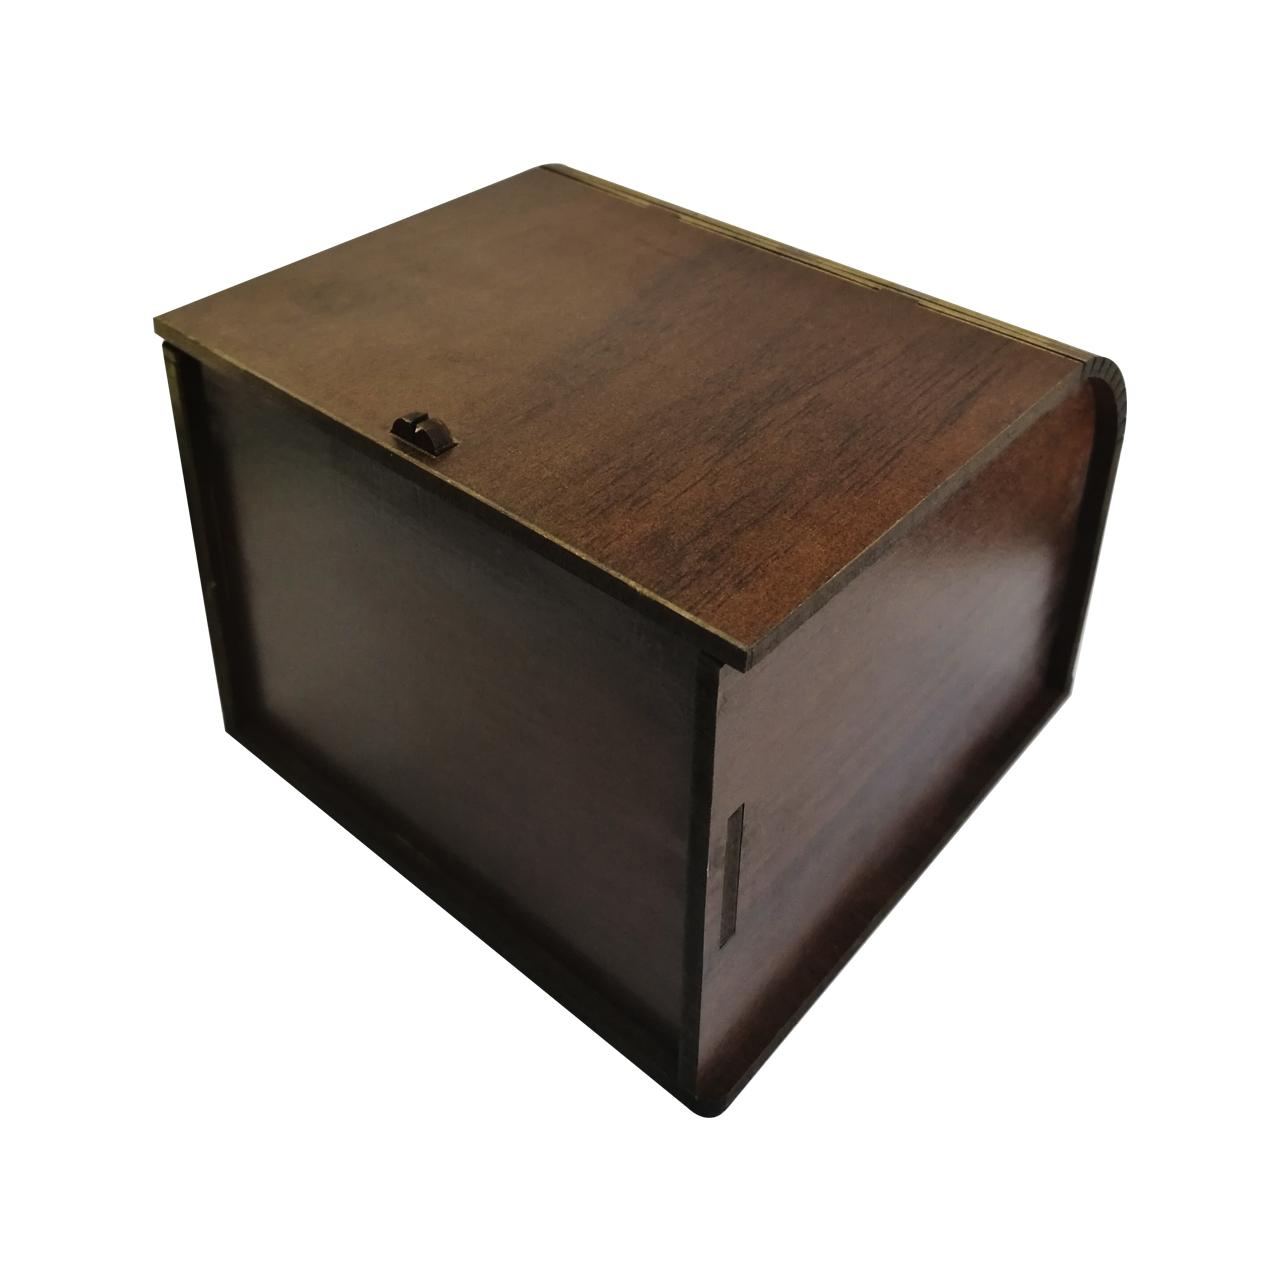 جعبه ساعت کد 1 54